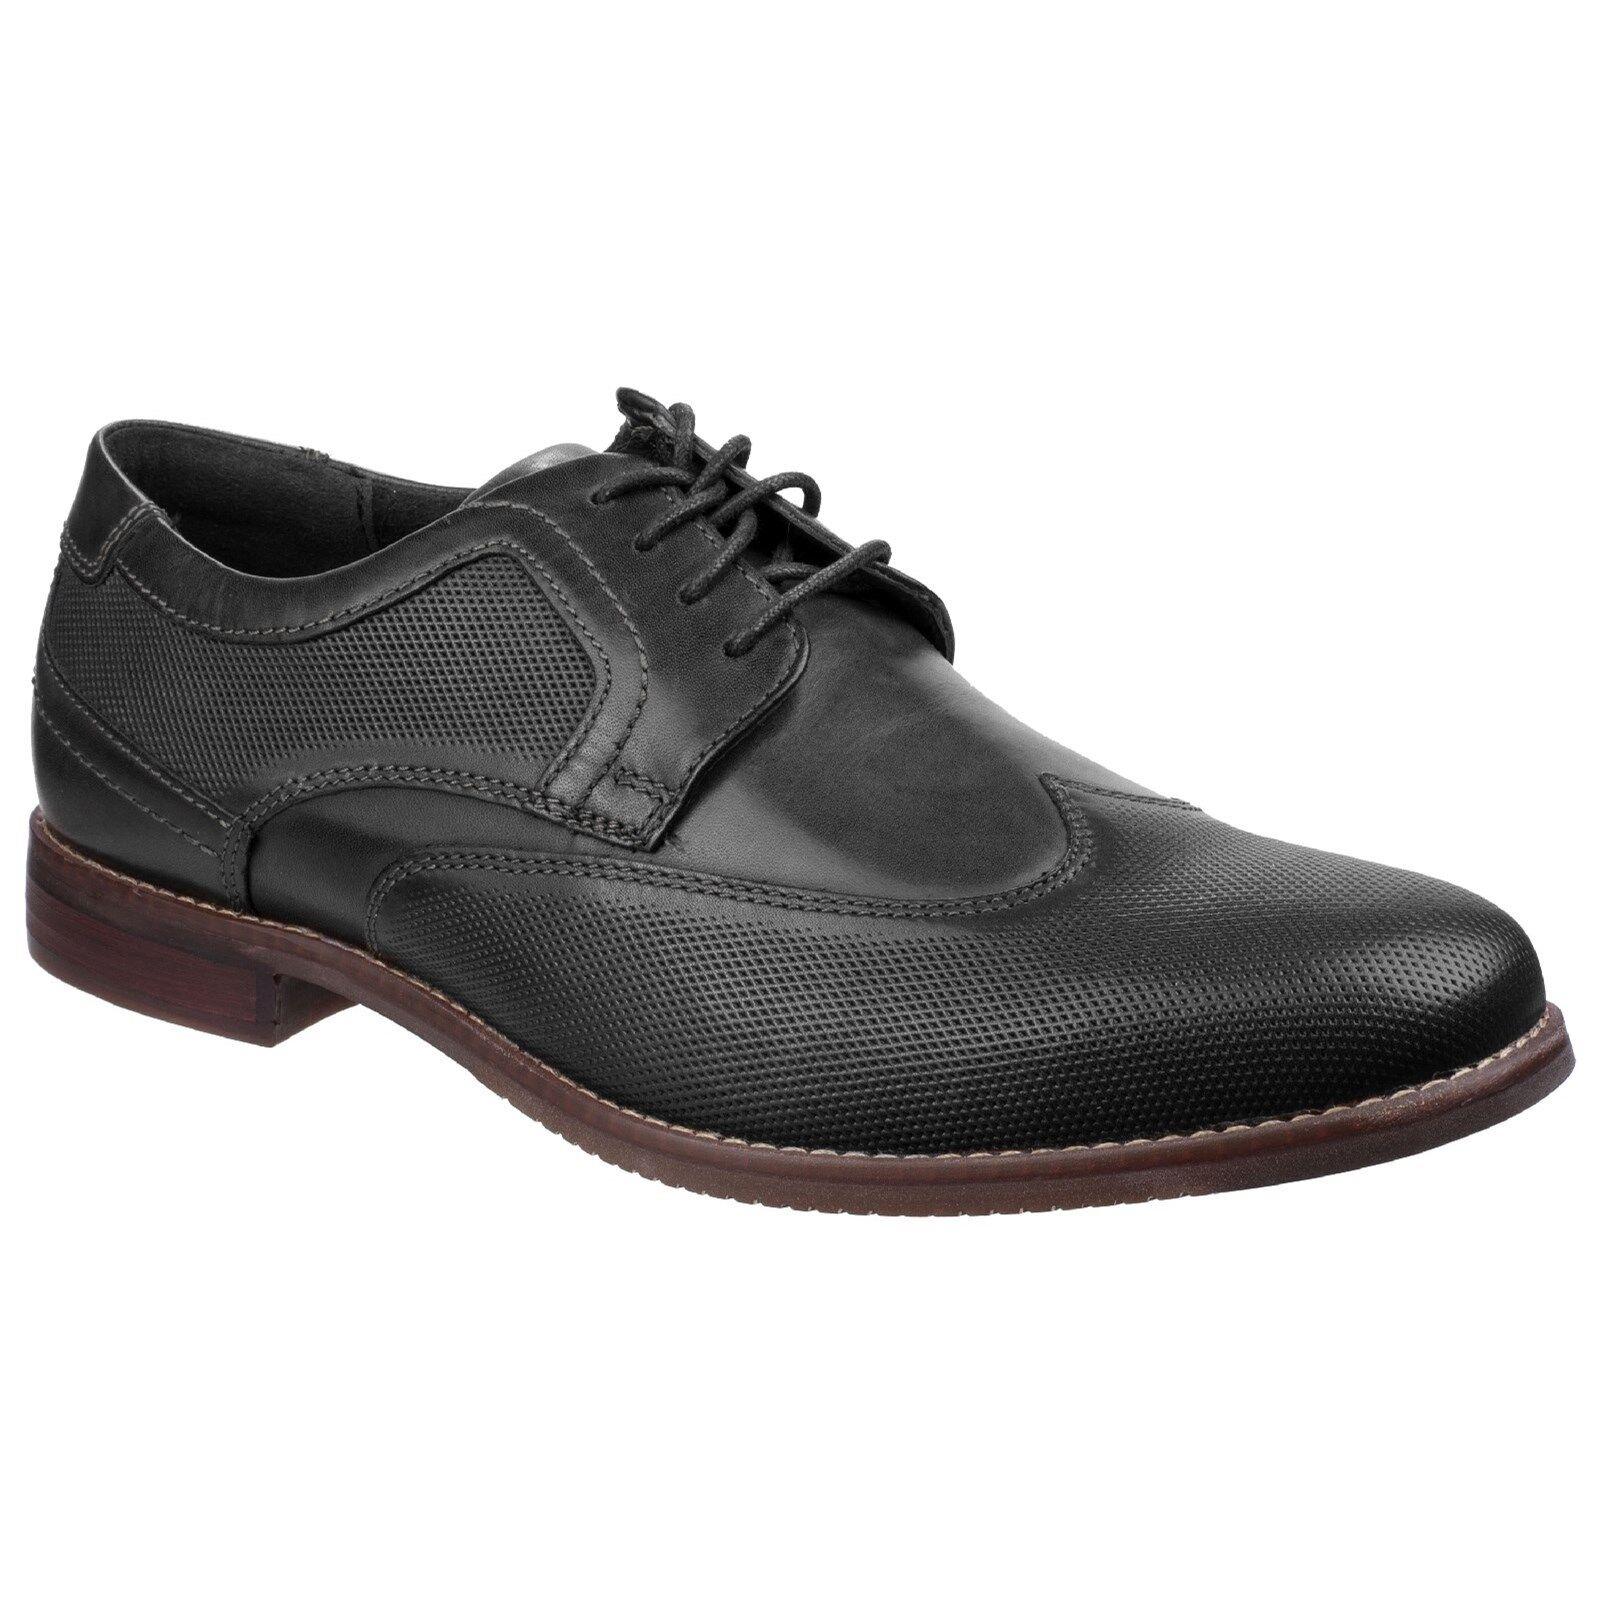 e1edaed01fa07f Rockport Stil Zweck Perf Schuhe Herren Classic Leder Wingtip Smart  Schnürschuh